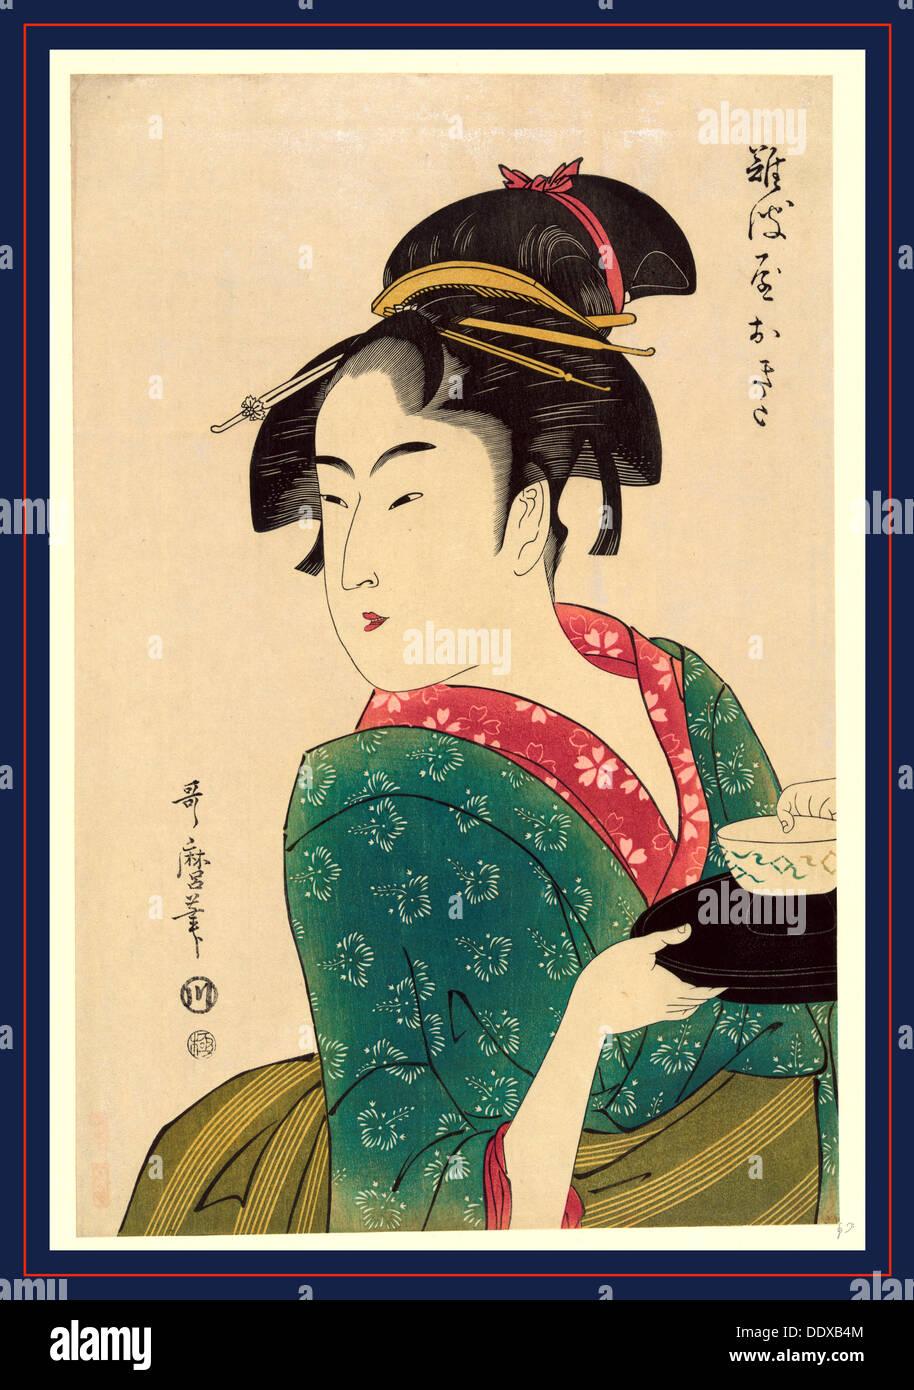 Naniwaya Okita, Okita Naniwa-ya. [1793, später gedruckt], 1 print: Holzschnitt, Farbe, Print zeigt Naniwaya Stockbild